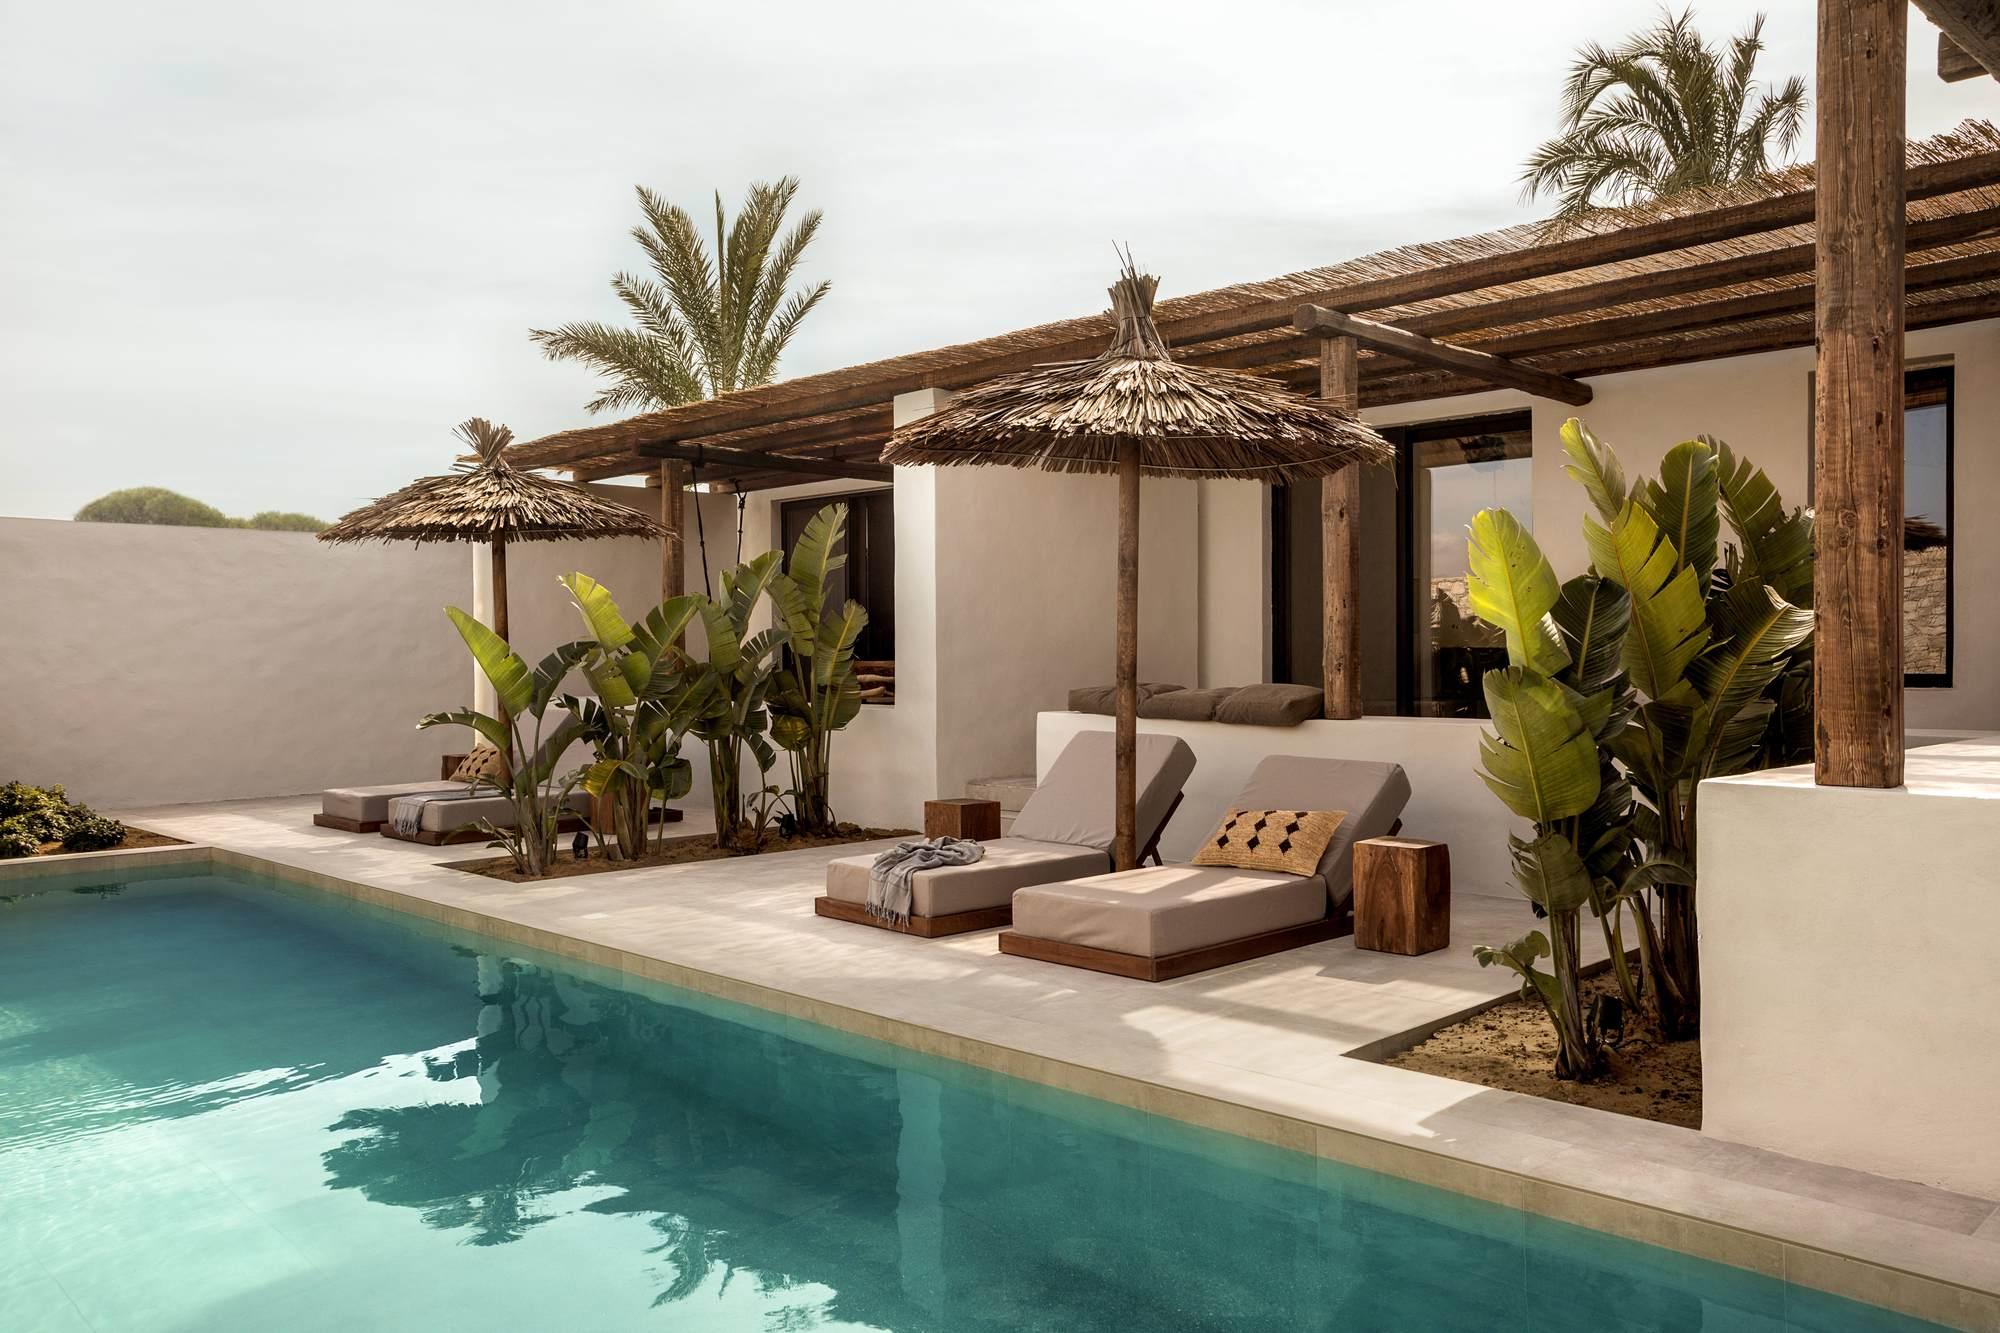 gallery of casa cook kos hotel mastrominas architecture 26. Black Bedroom Furniture Sets. Home Design Ideas